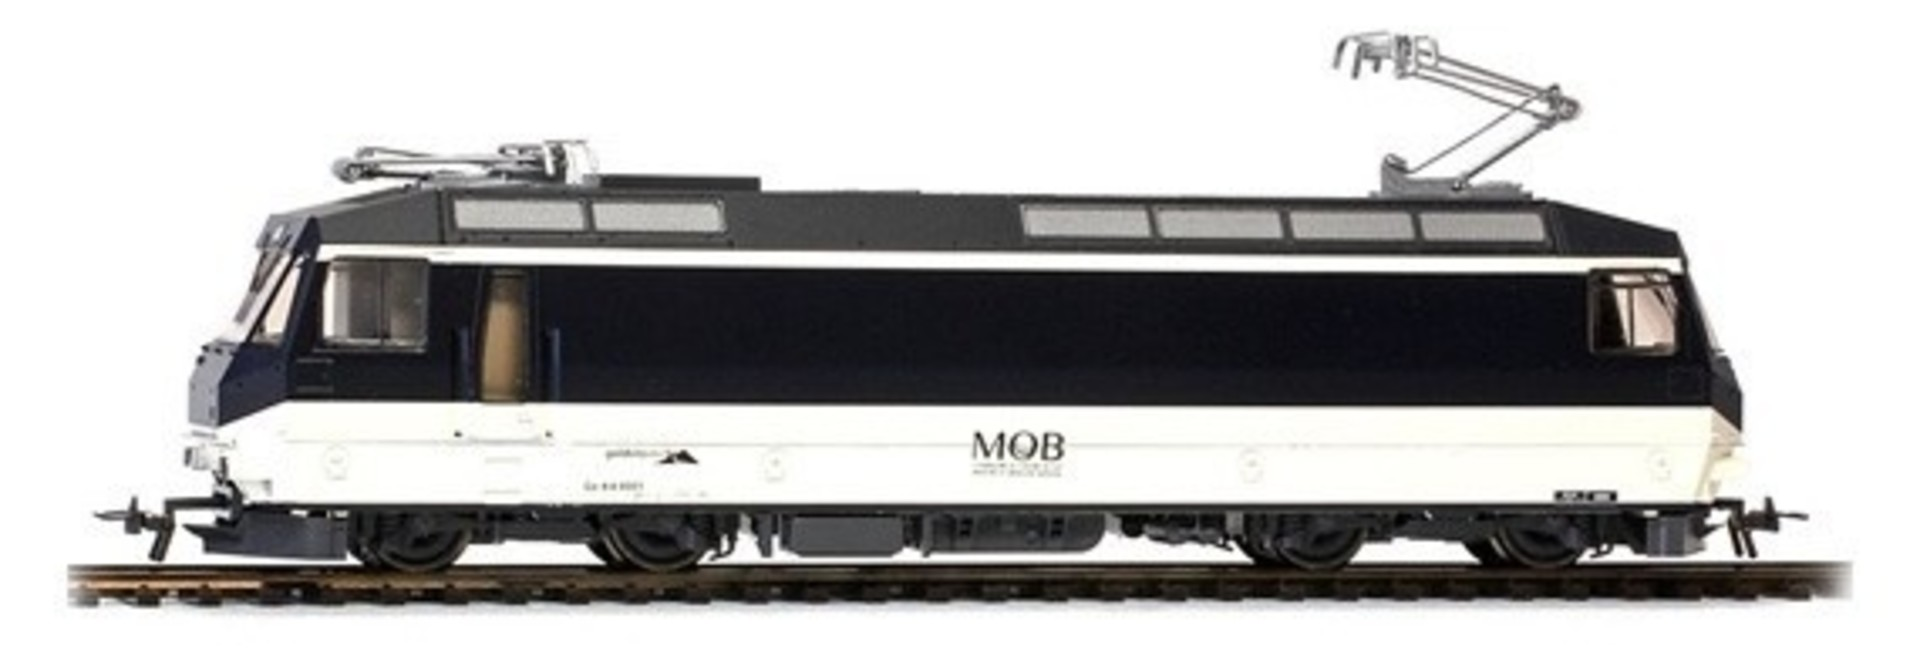 1359351 MOB Ge 4/4 8001 Universallok neues Design digital